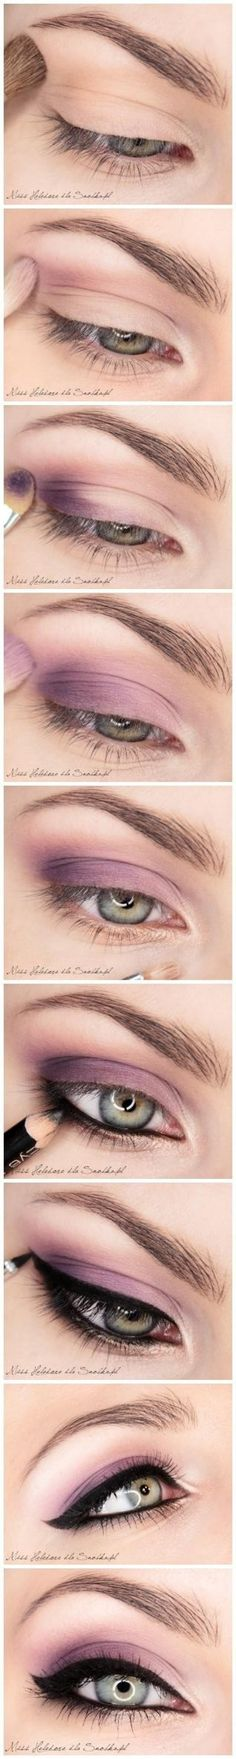 Purple Smokey Eye Makeup Tutorial ♥ Best Bridal Makeup